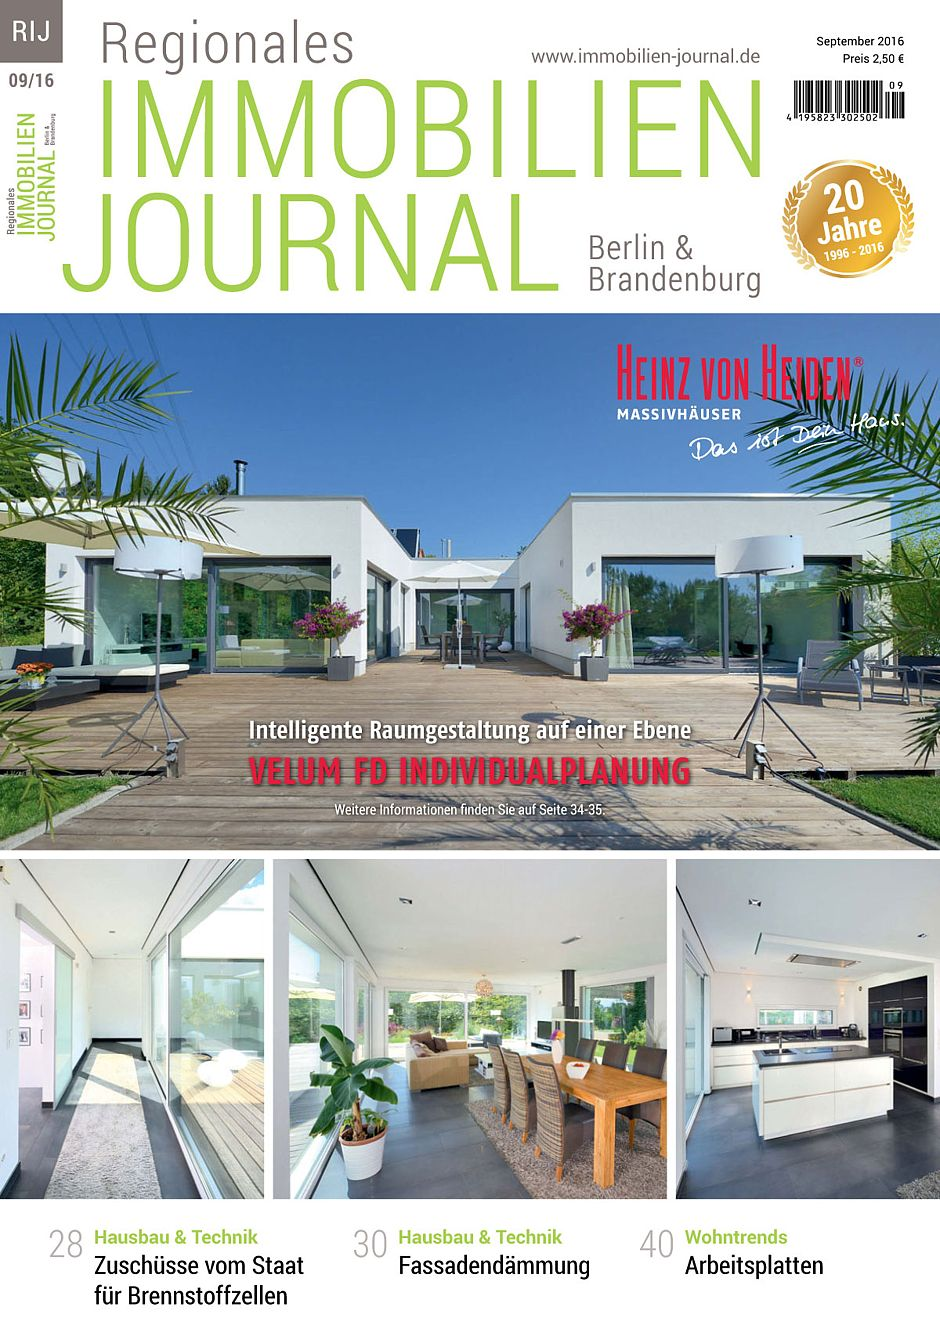 Regionales immobilien journal berlin brandenburg september for Hausbaufirmen berlin